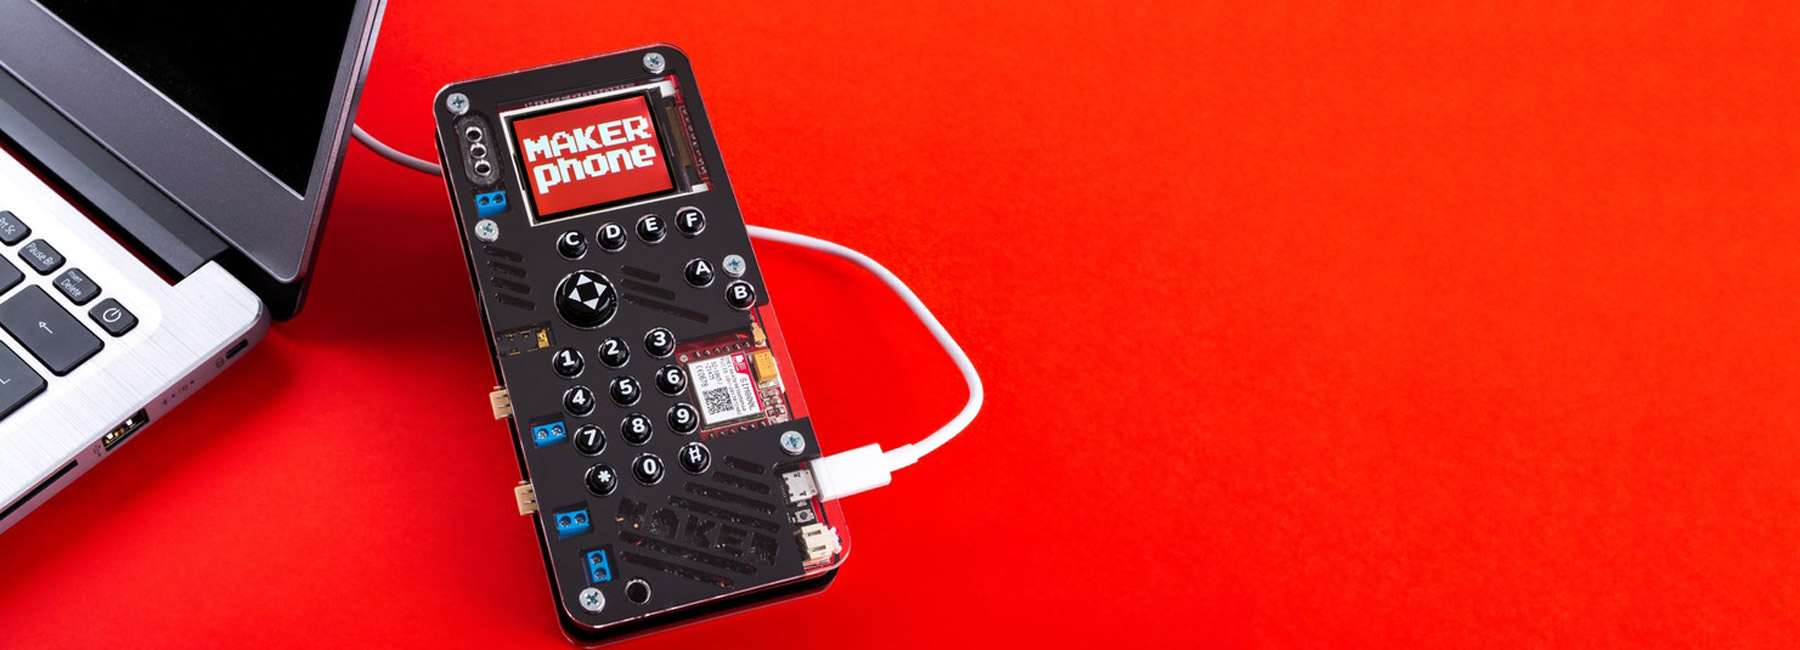 makerphone